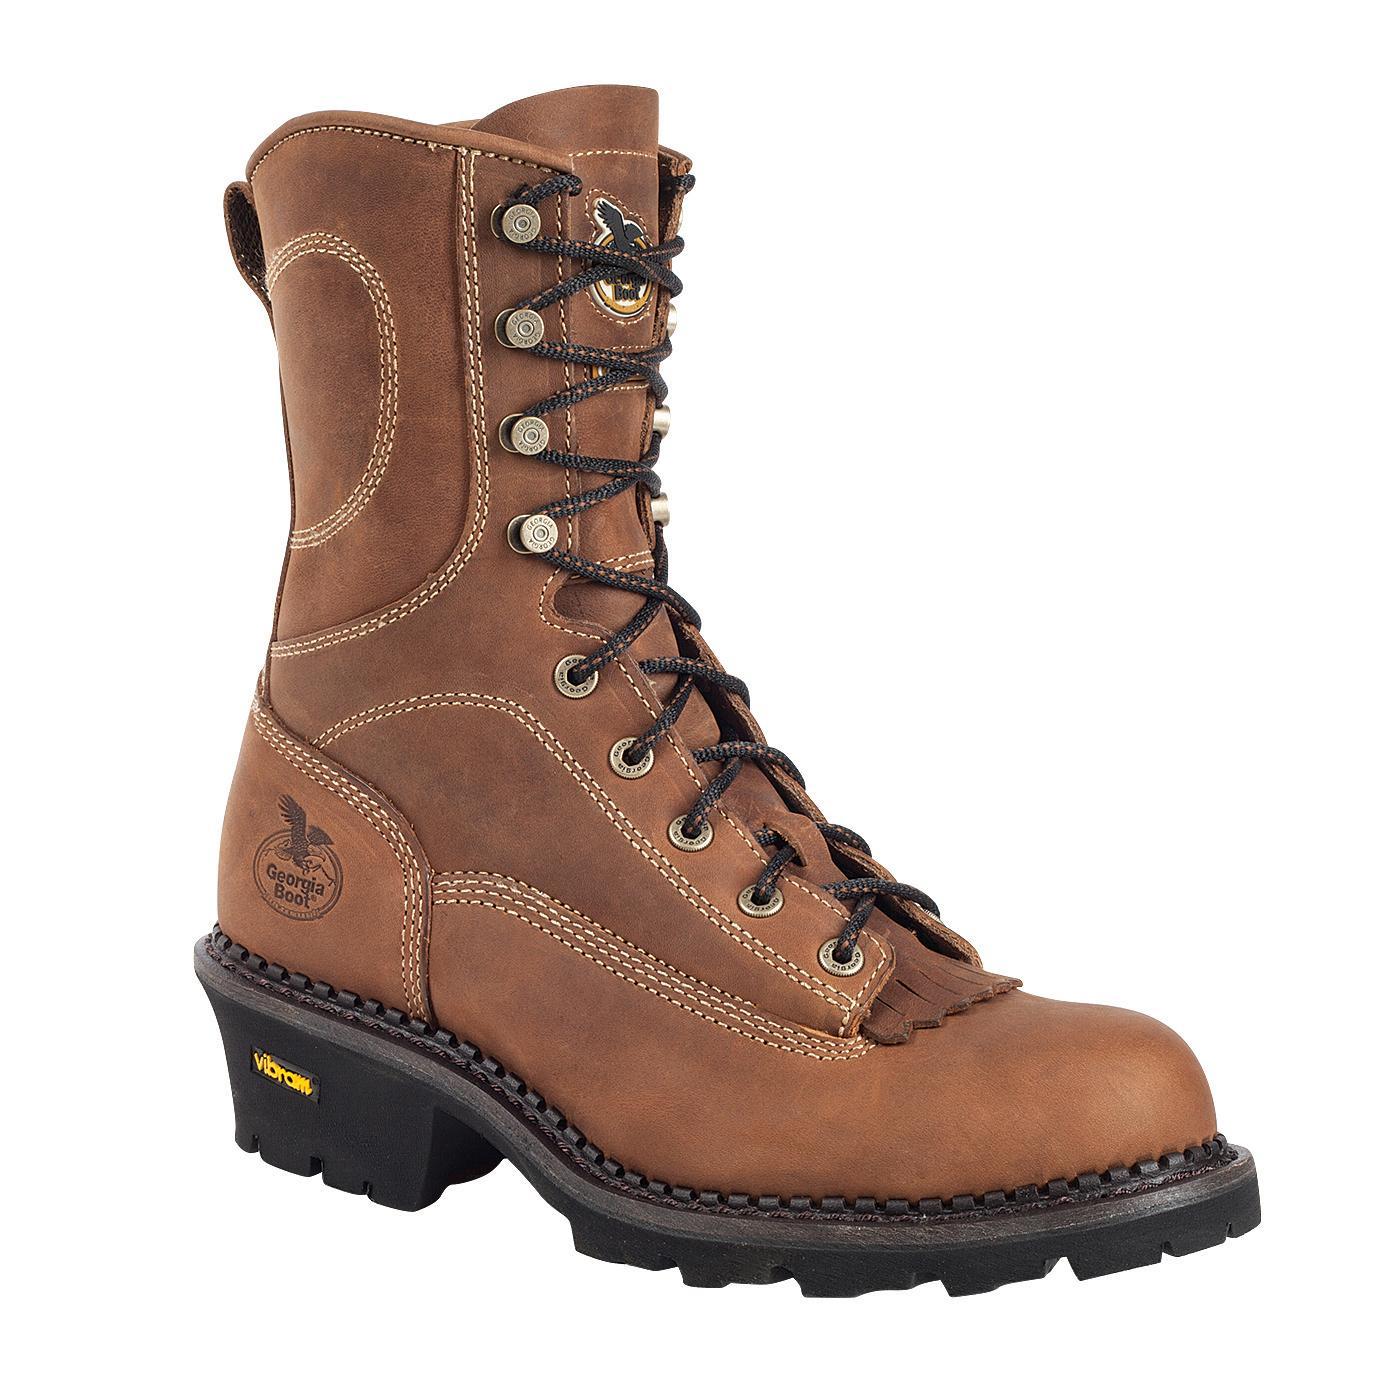 boots extralarge georgia work metatarsal comforter steel boot met comfortable hammer internal toe guard